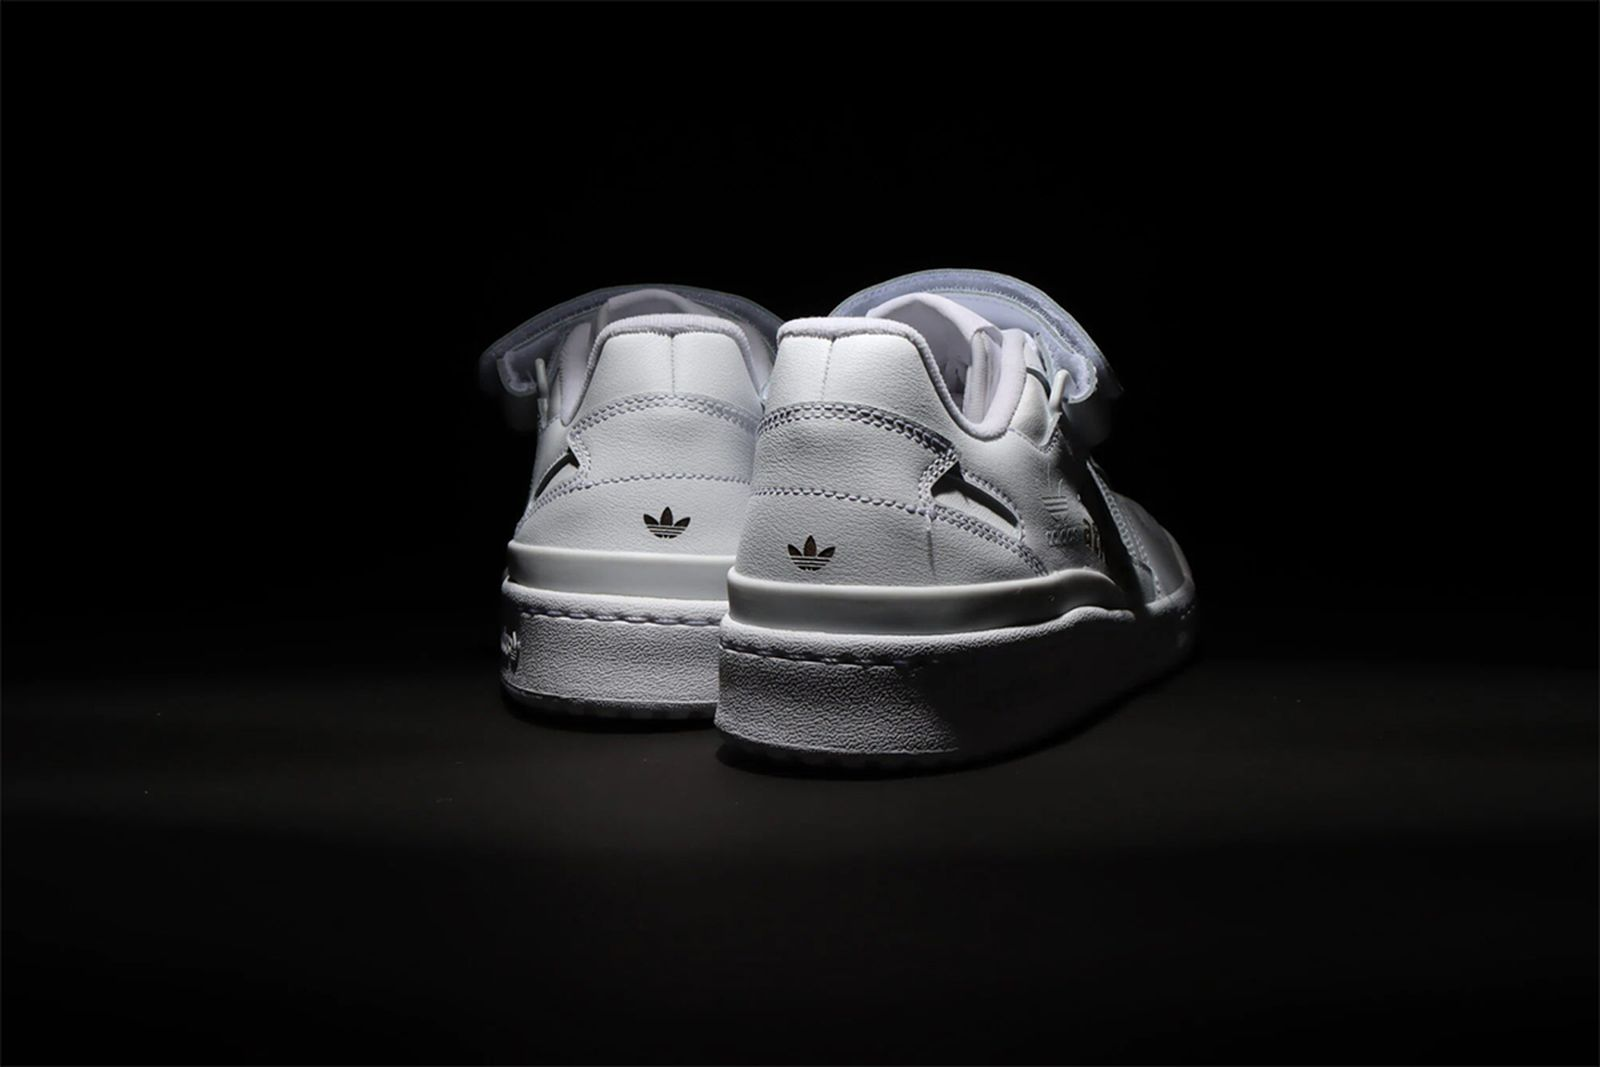 atmos-adidas-forum-low-release-info-06